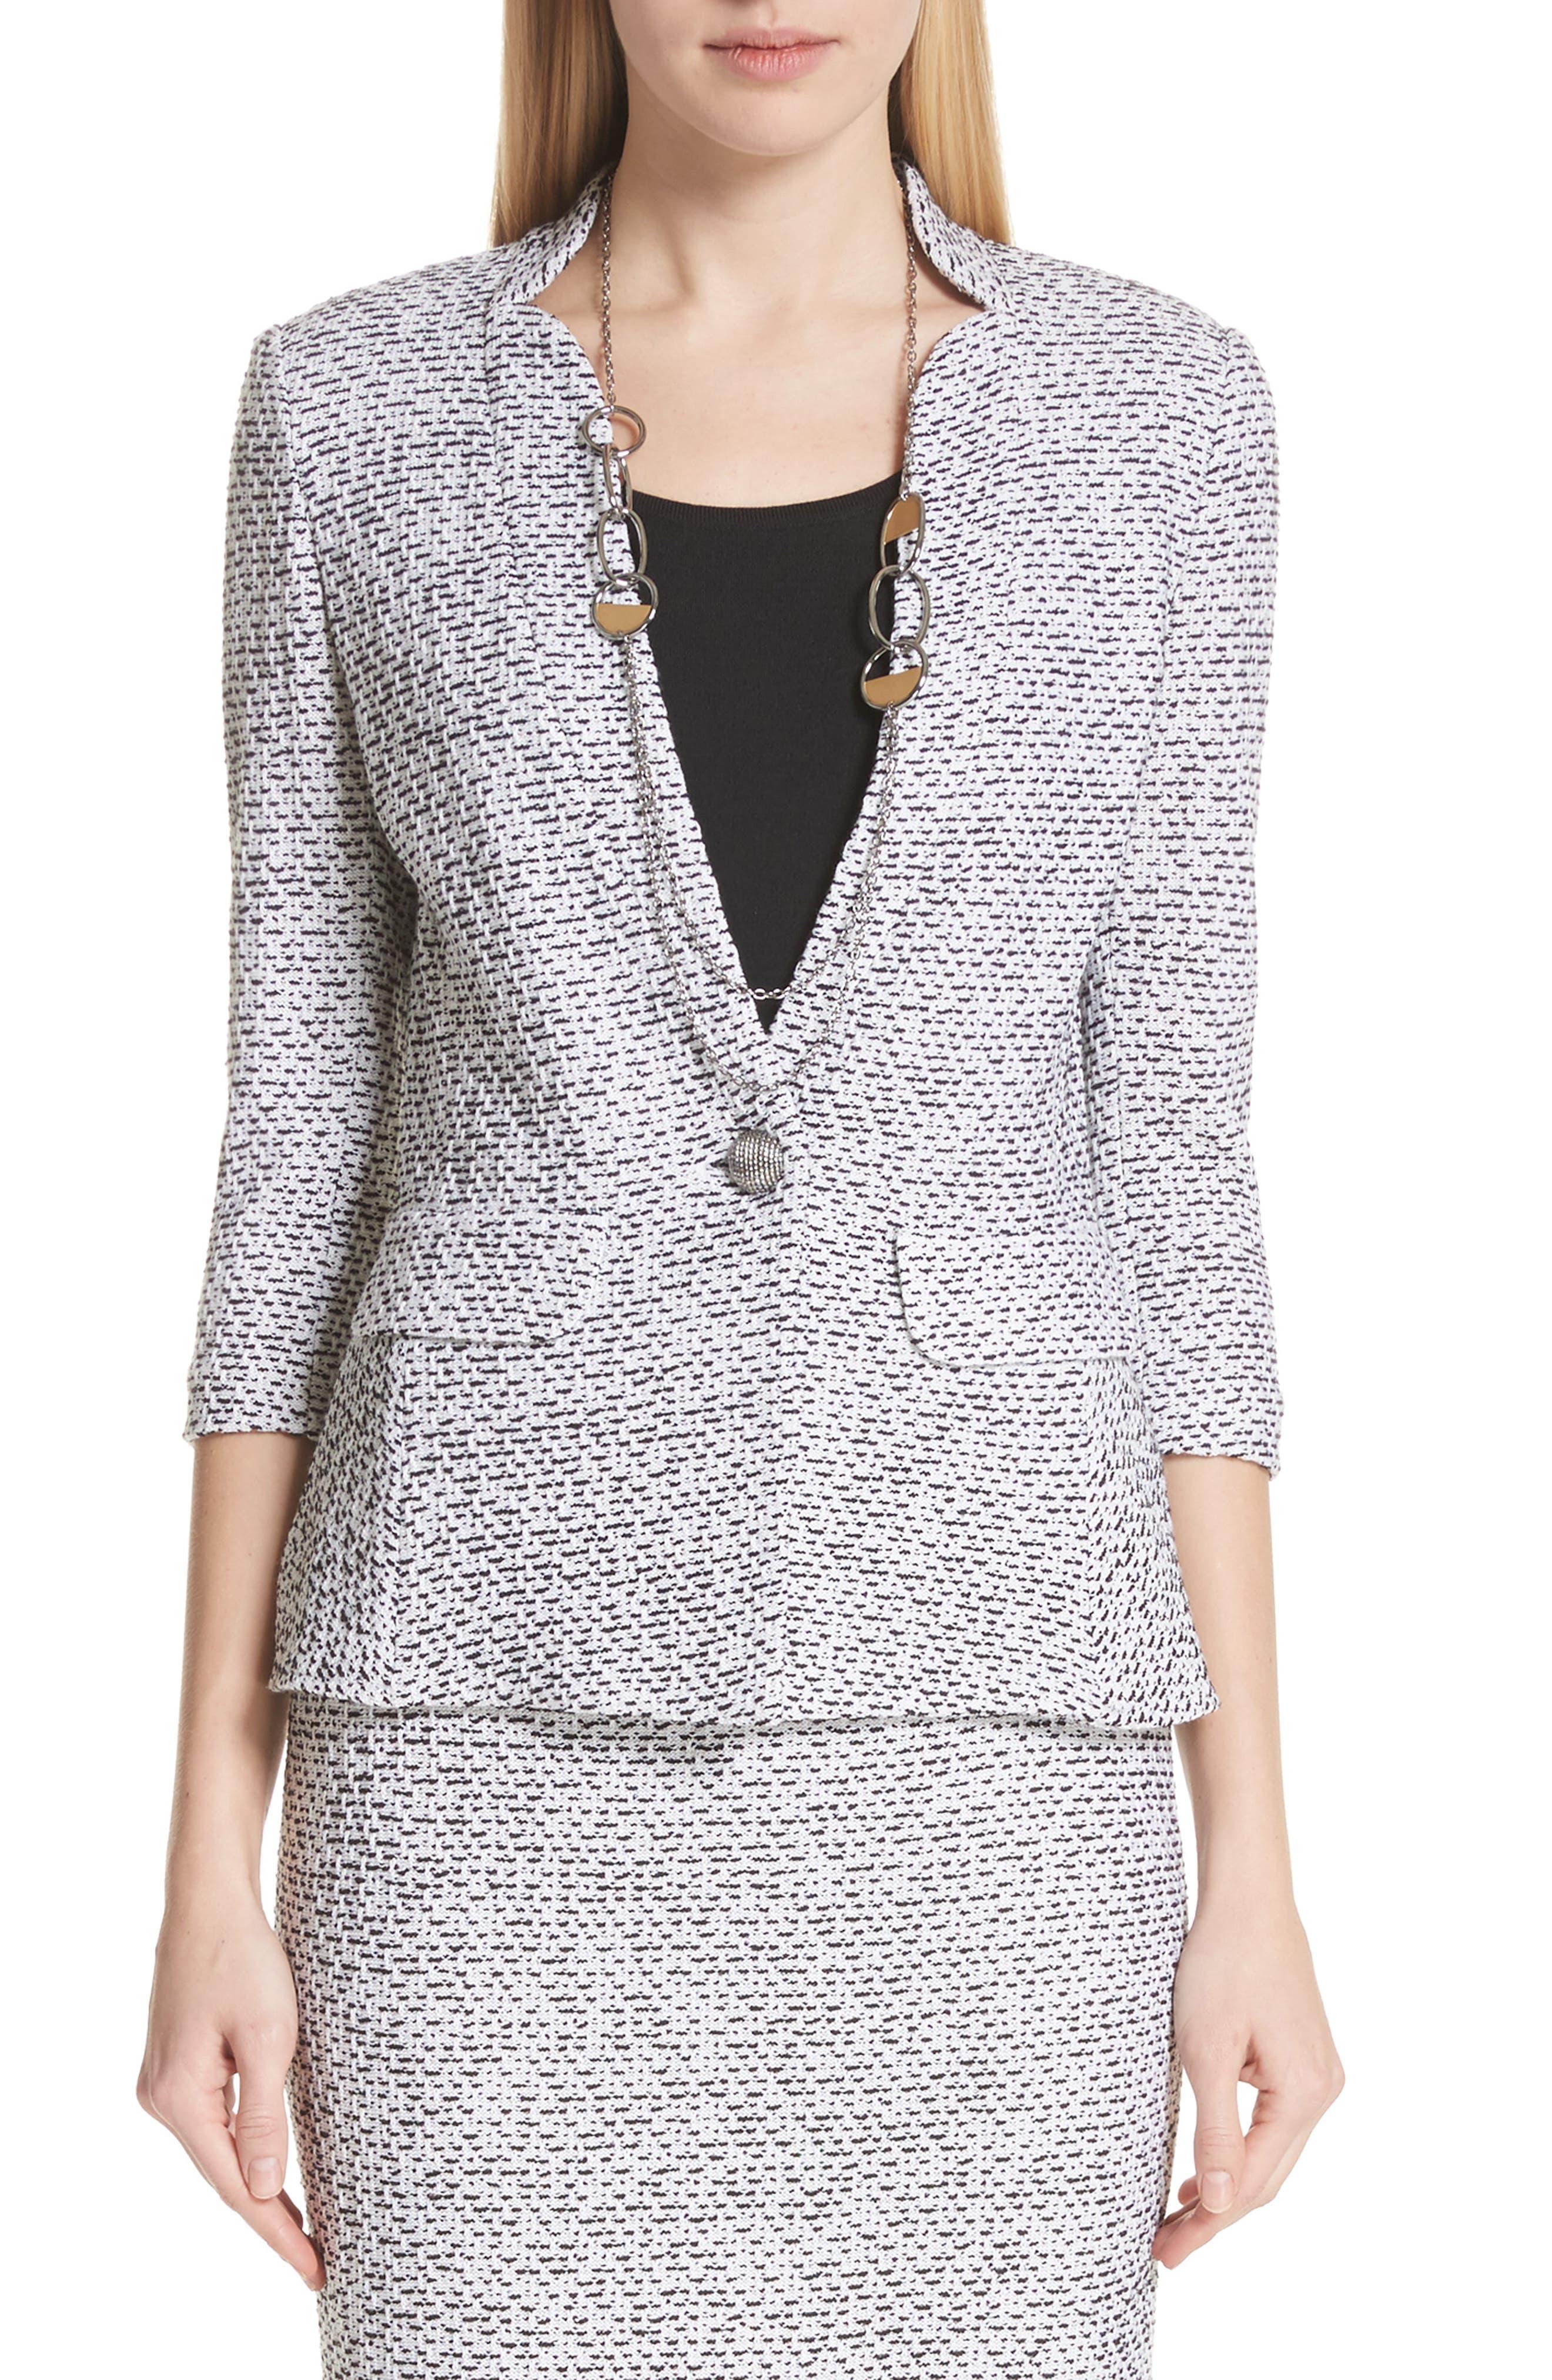 Olivia Bouclé Knit Jacket,                         Main,                         color, WHITE/ CAVIAR